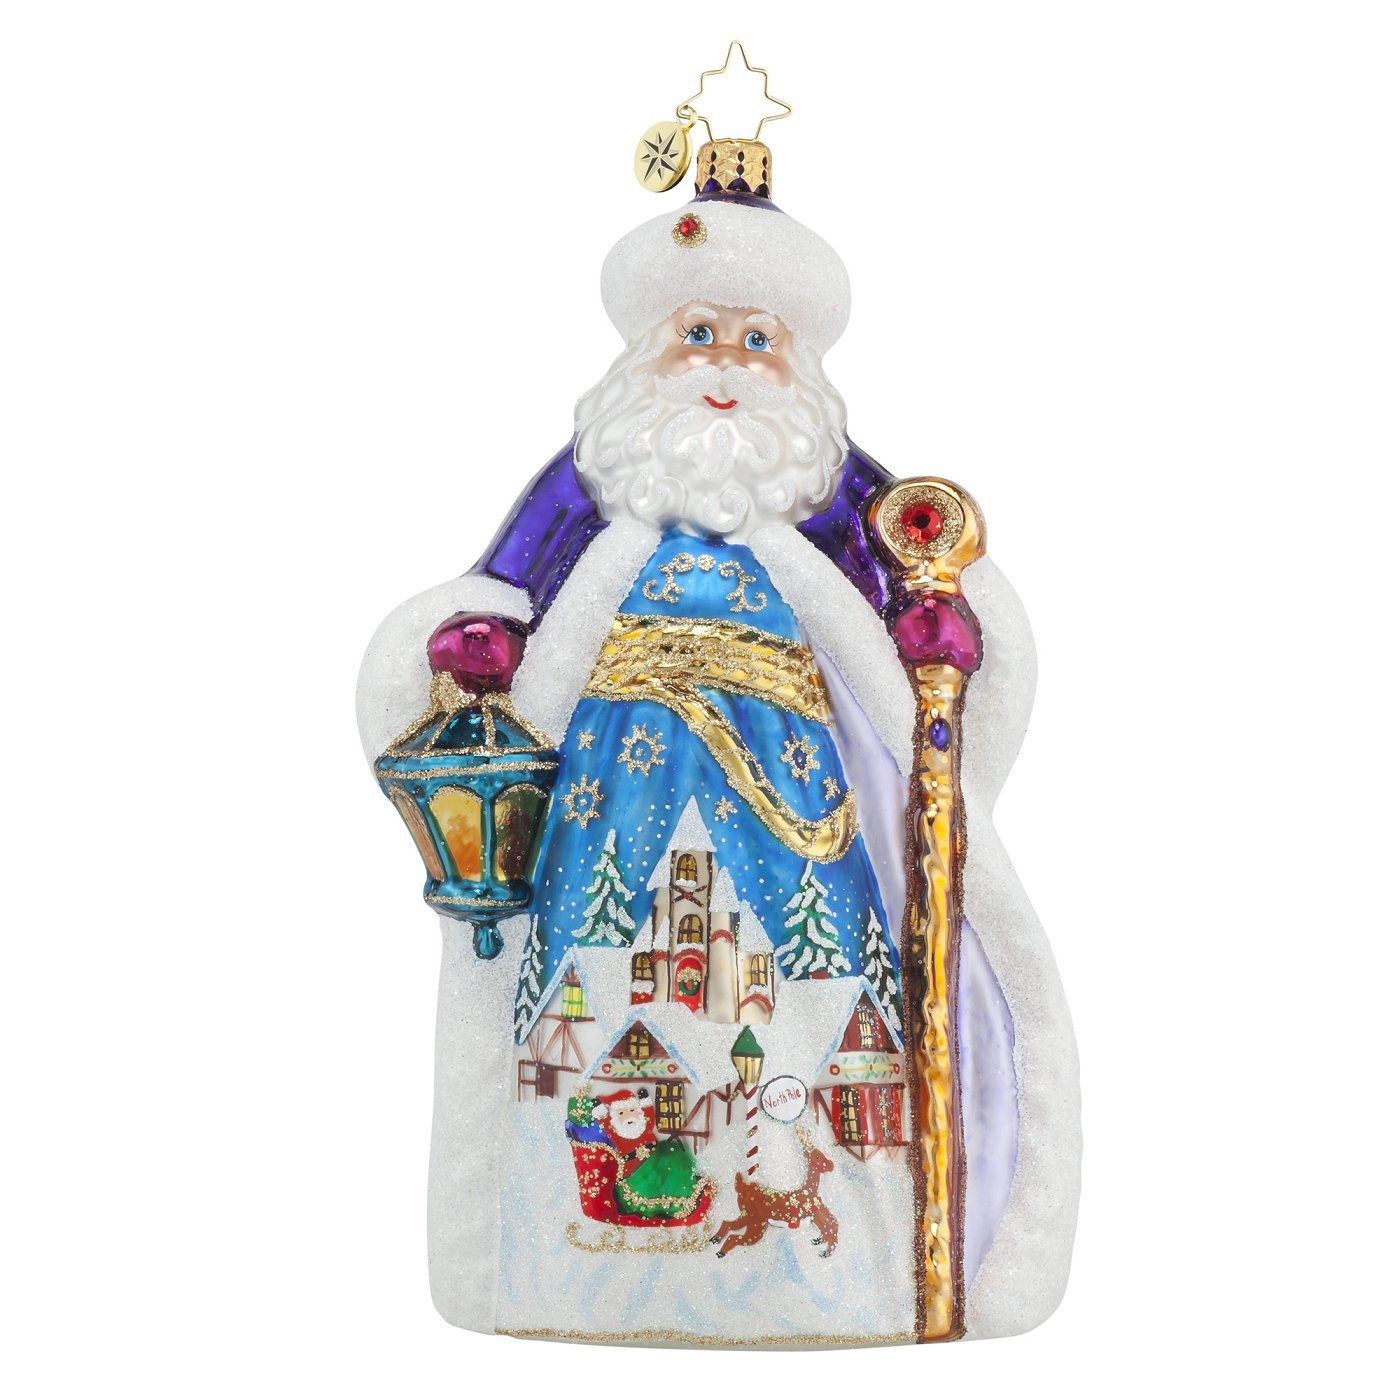 Christopher Radko Winter Dream Nicholas Santa Glass Christmas Ornament - Limited Edition of 900 Pieces